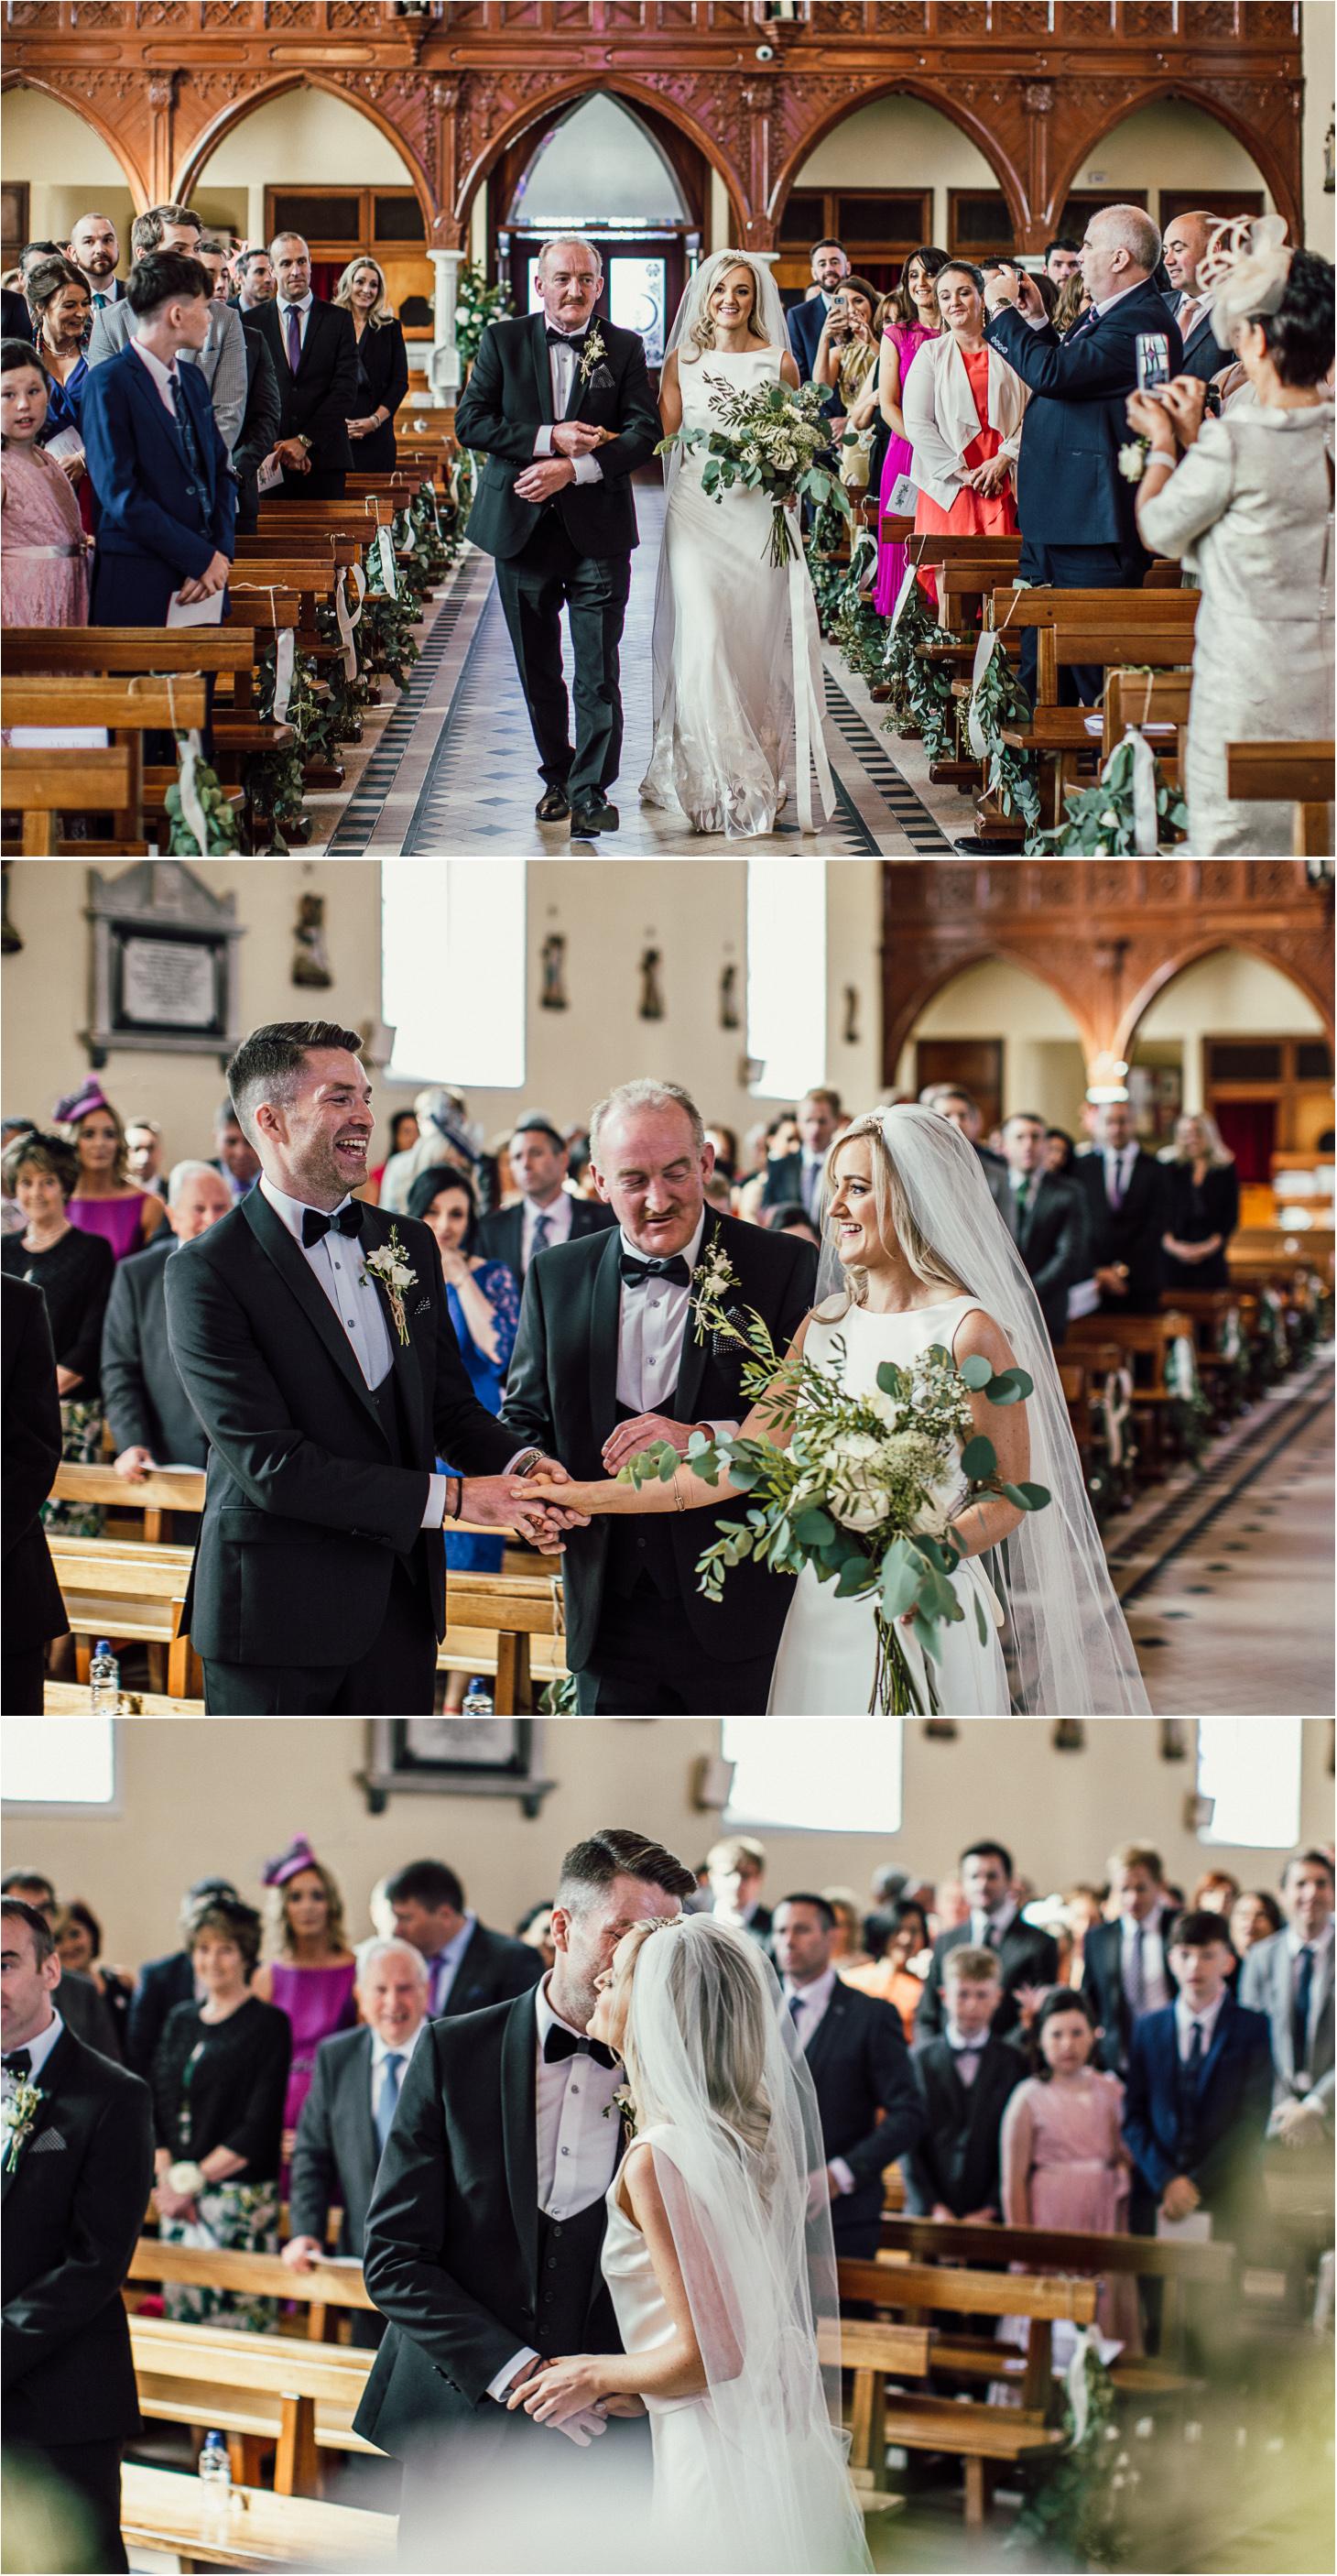 Virgina Lodge Photography. darren fitzpatrick. Wedding.8